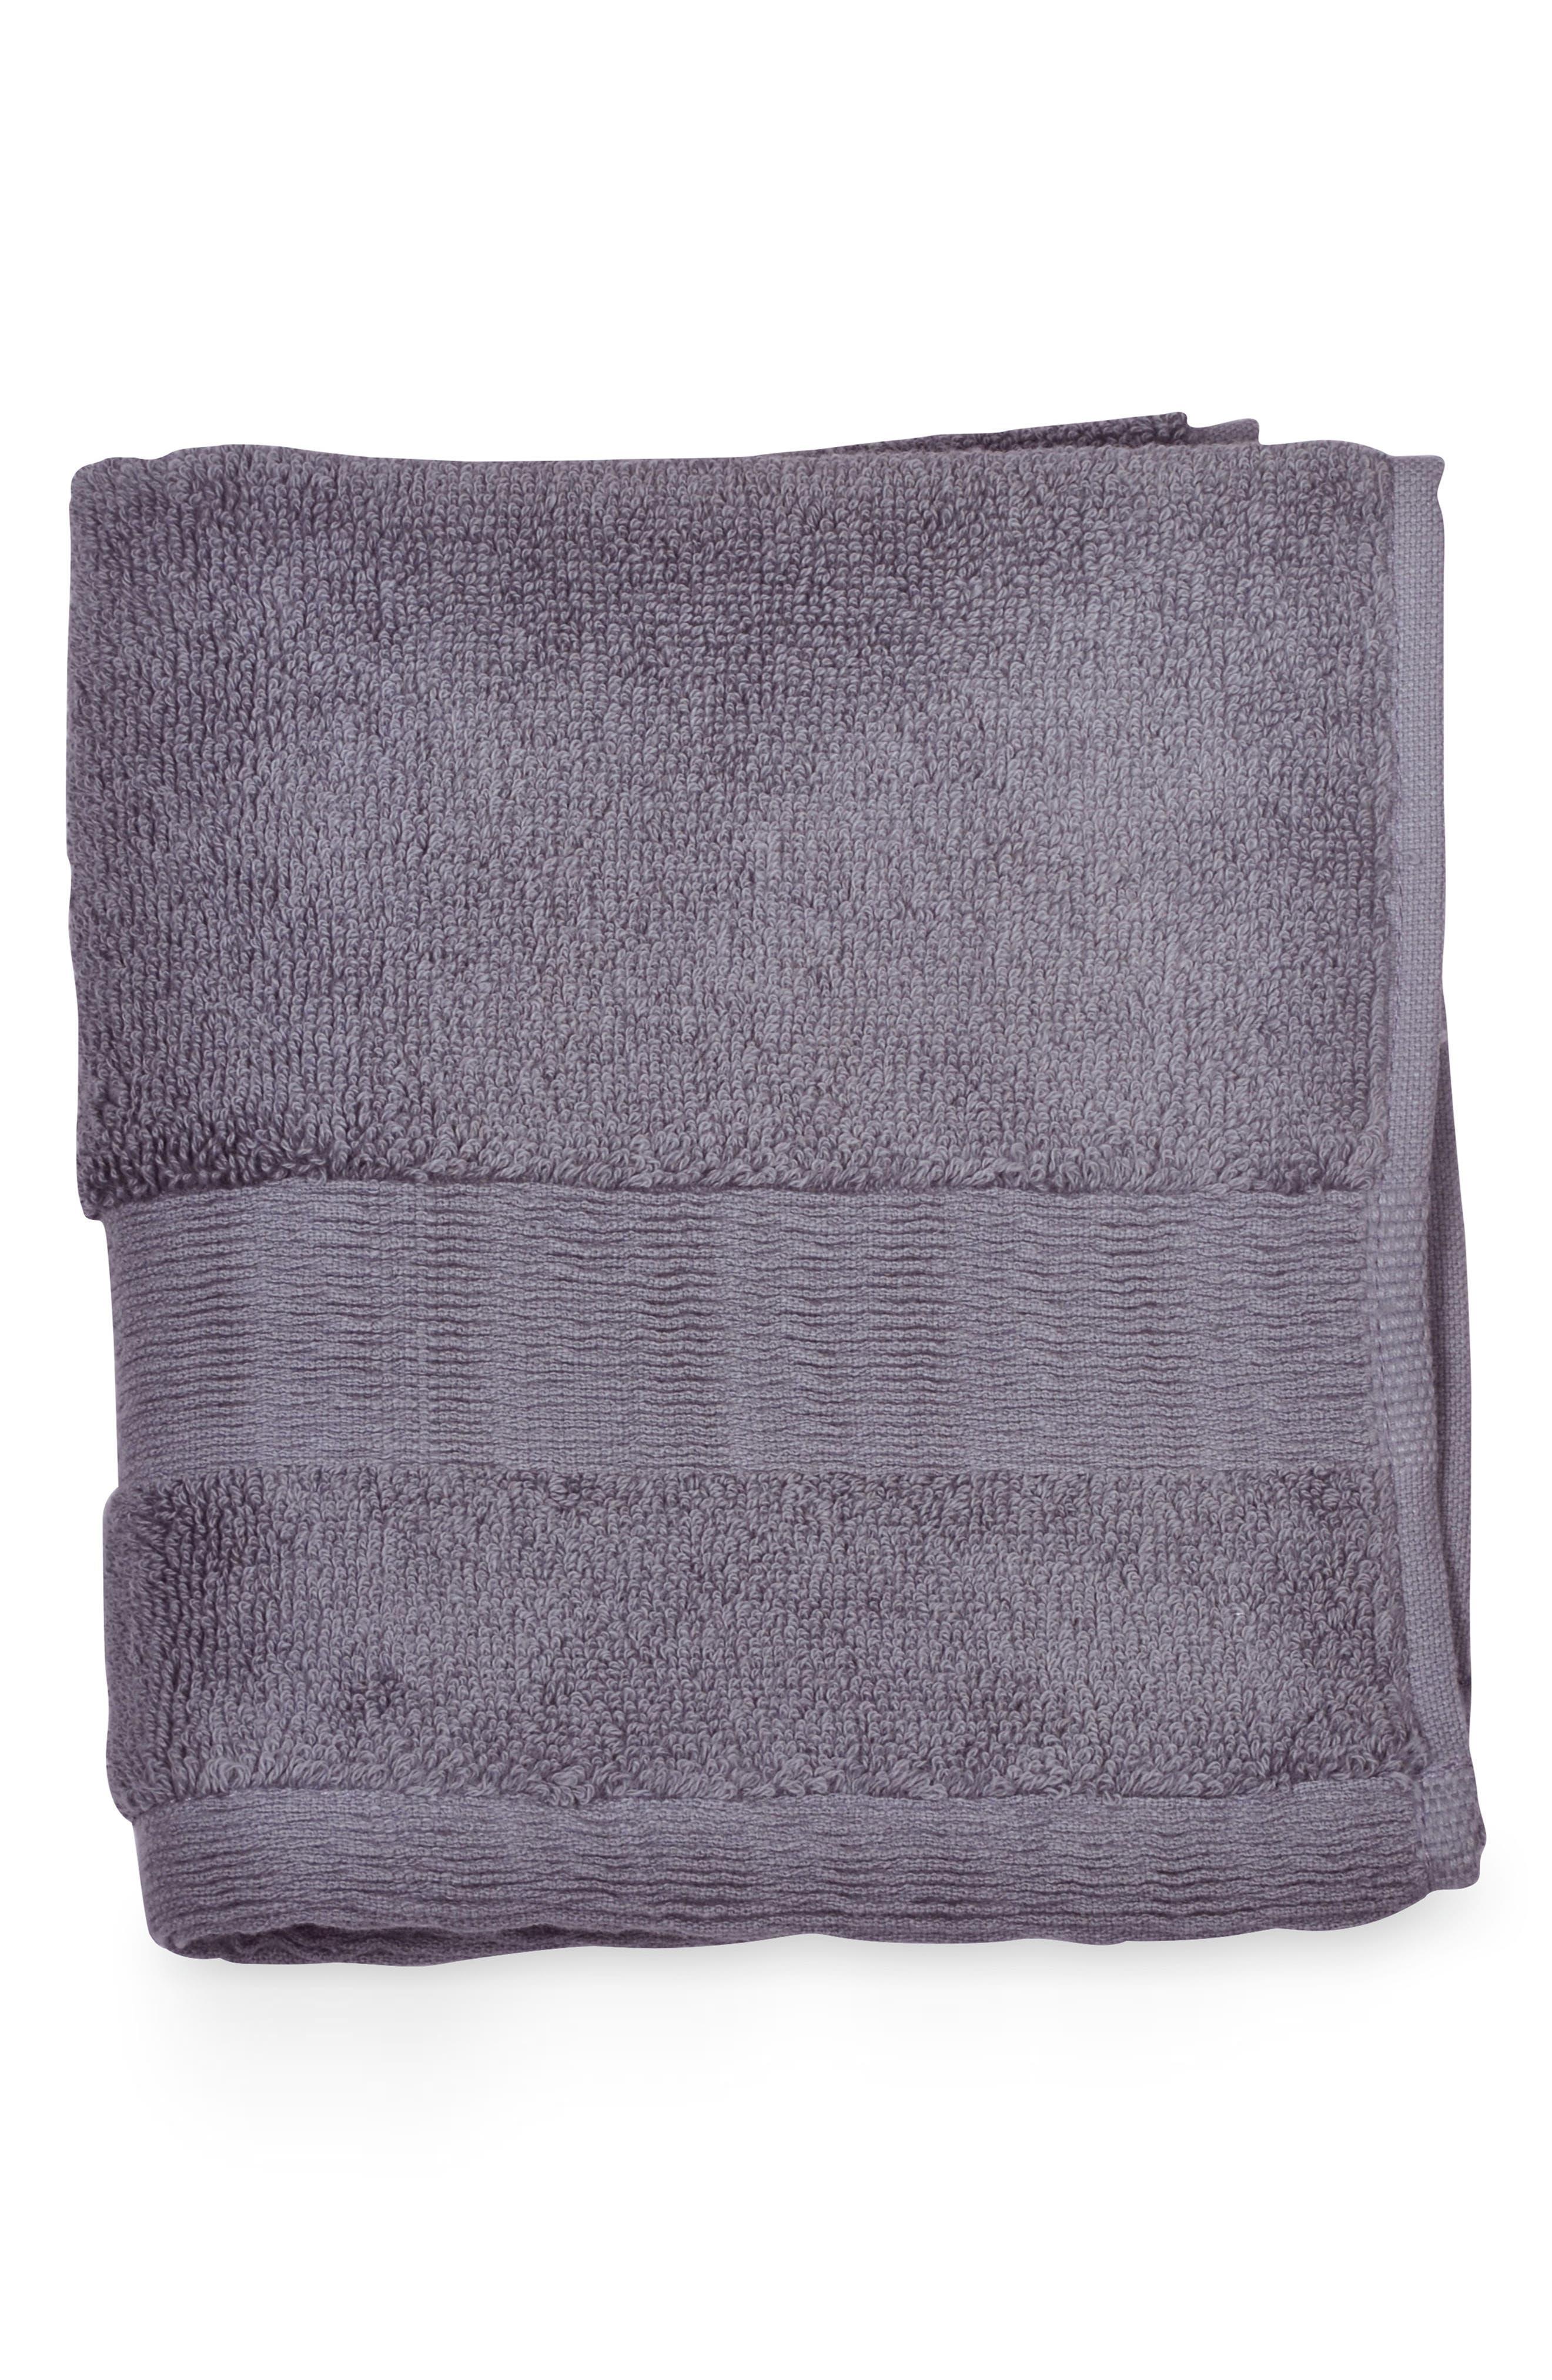 Mercer Washcloth,                         Main,                         color, 531